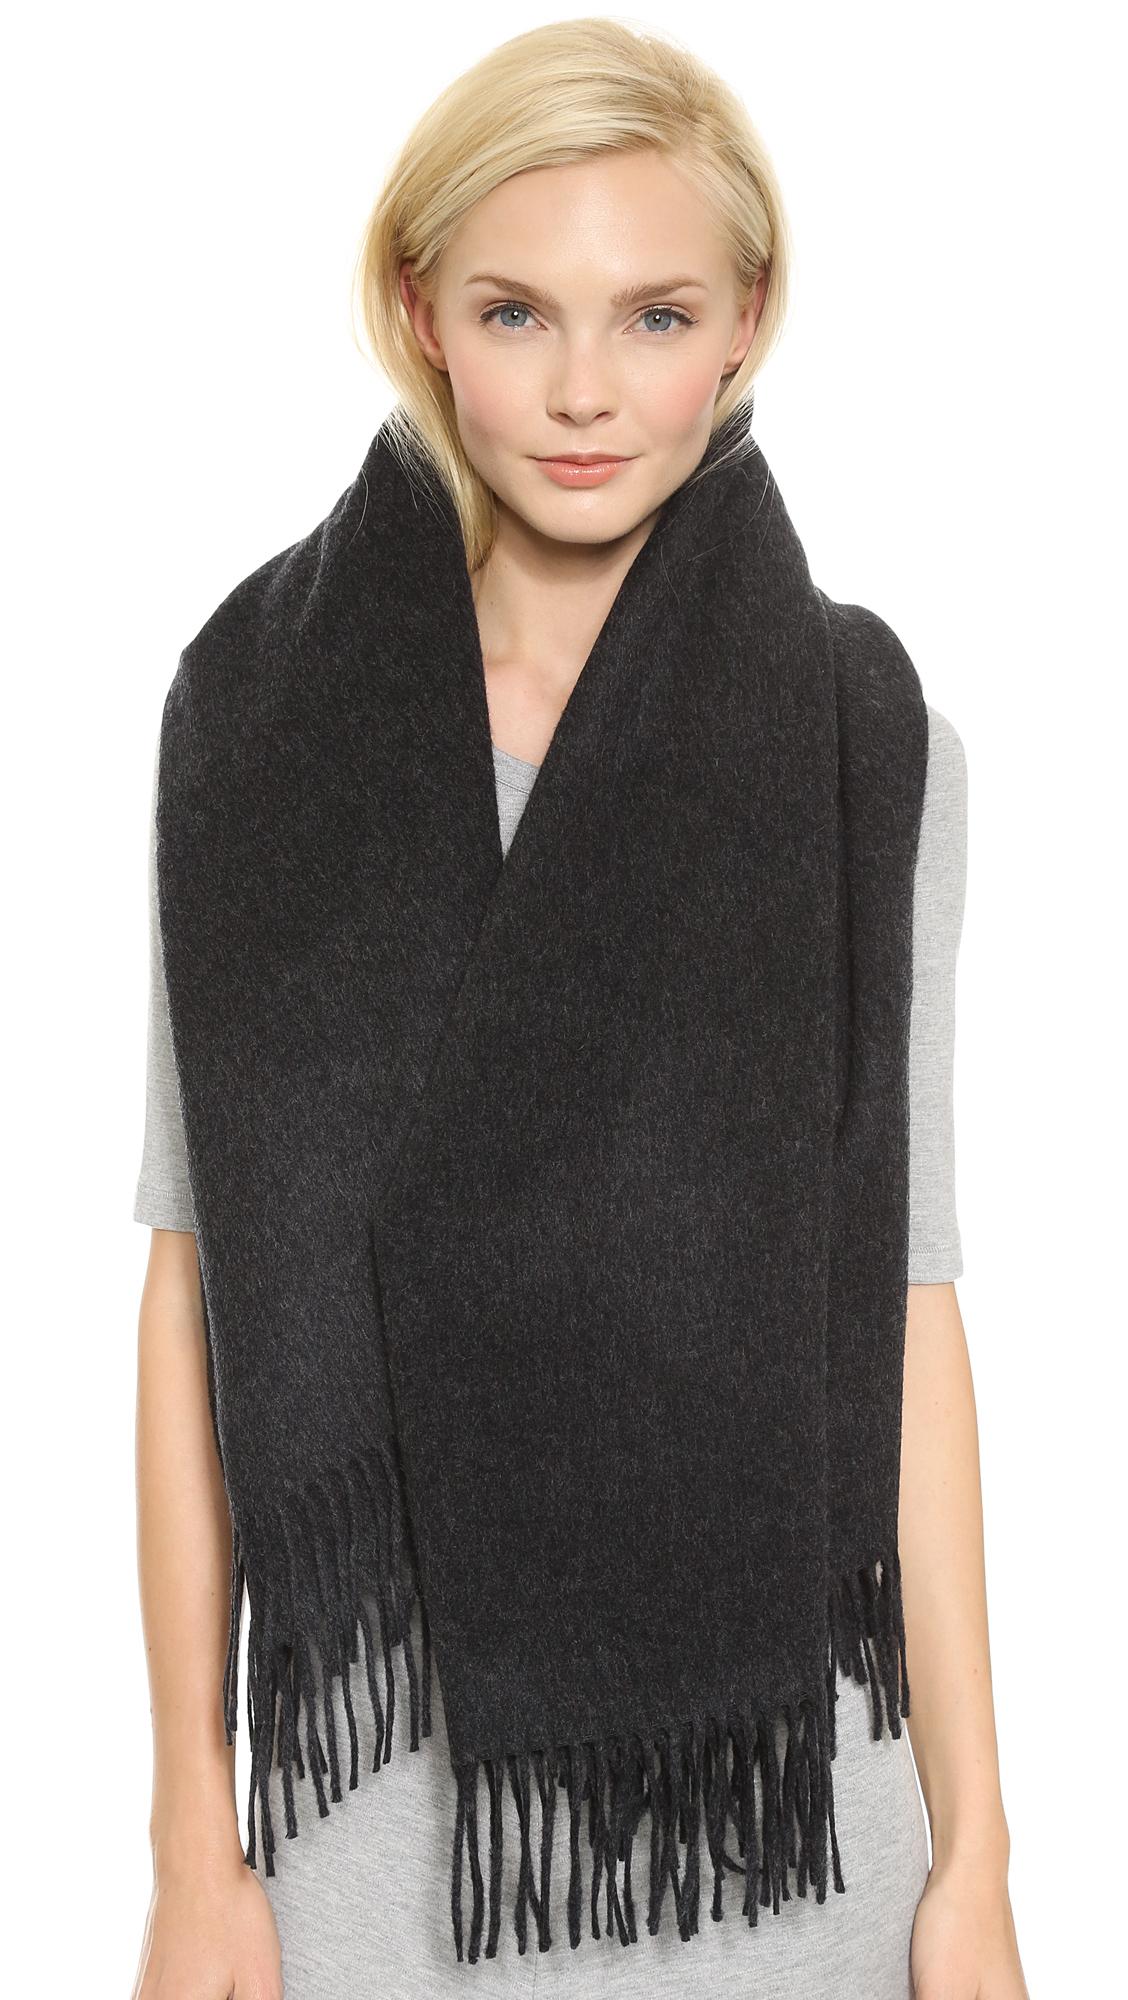 acne alaska oversized scarf navy in black lyst